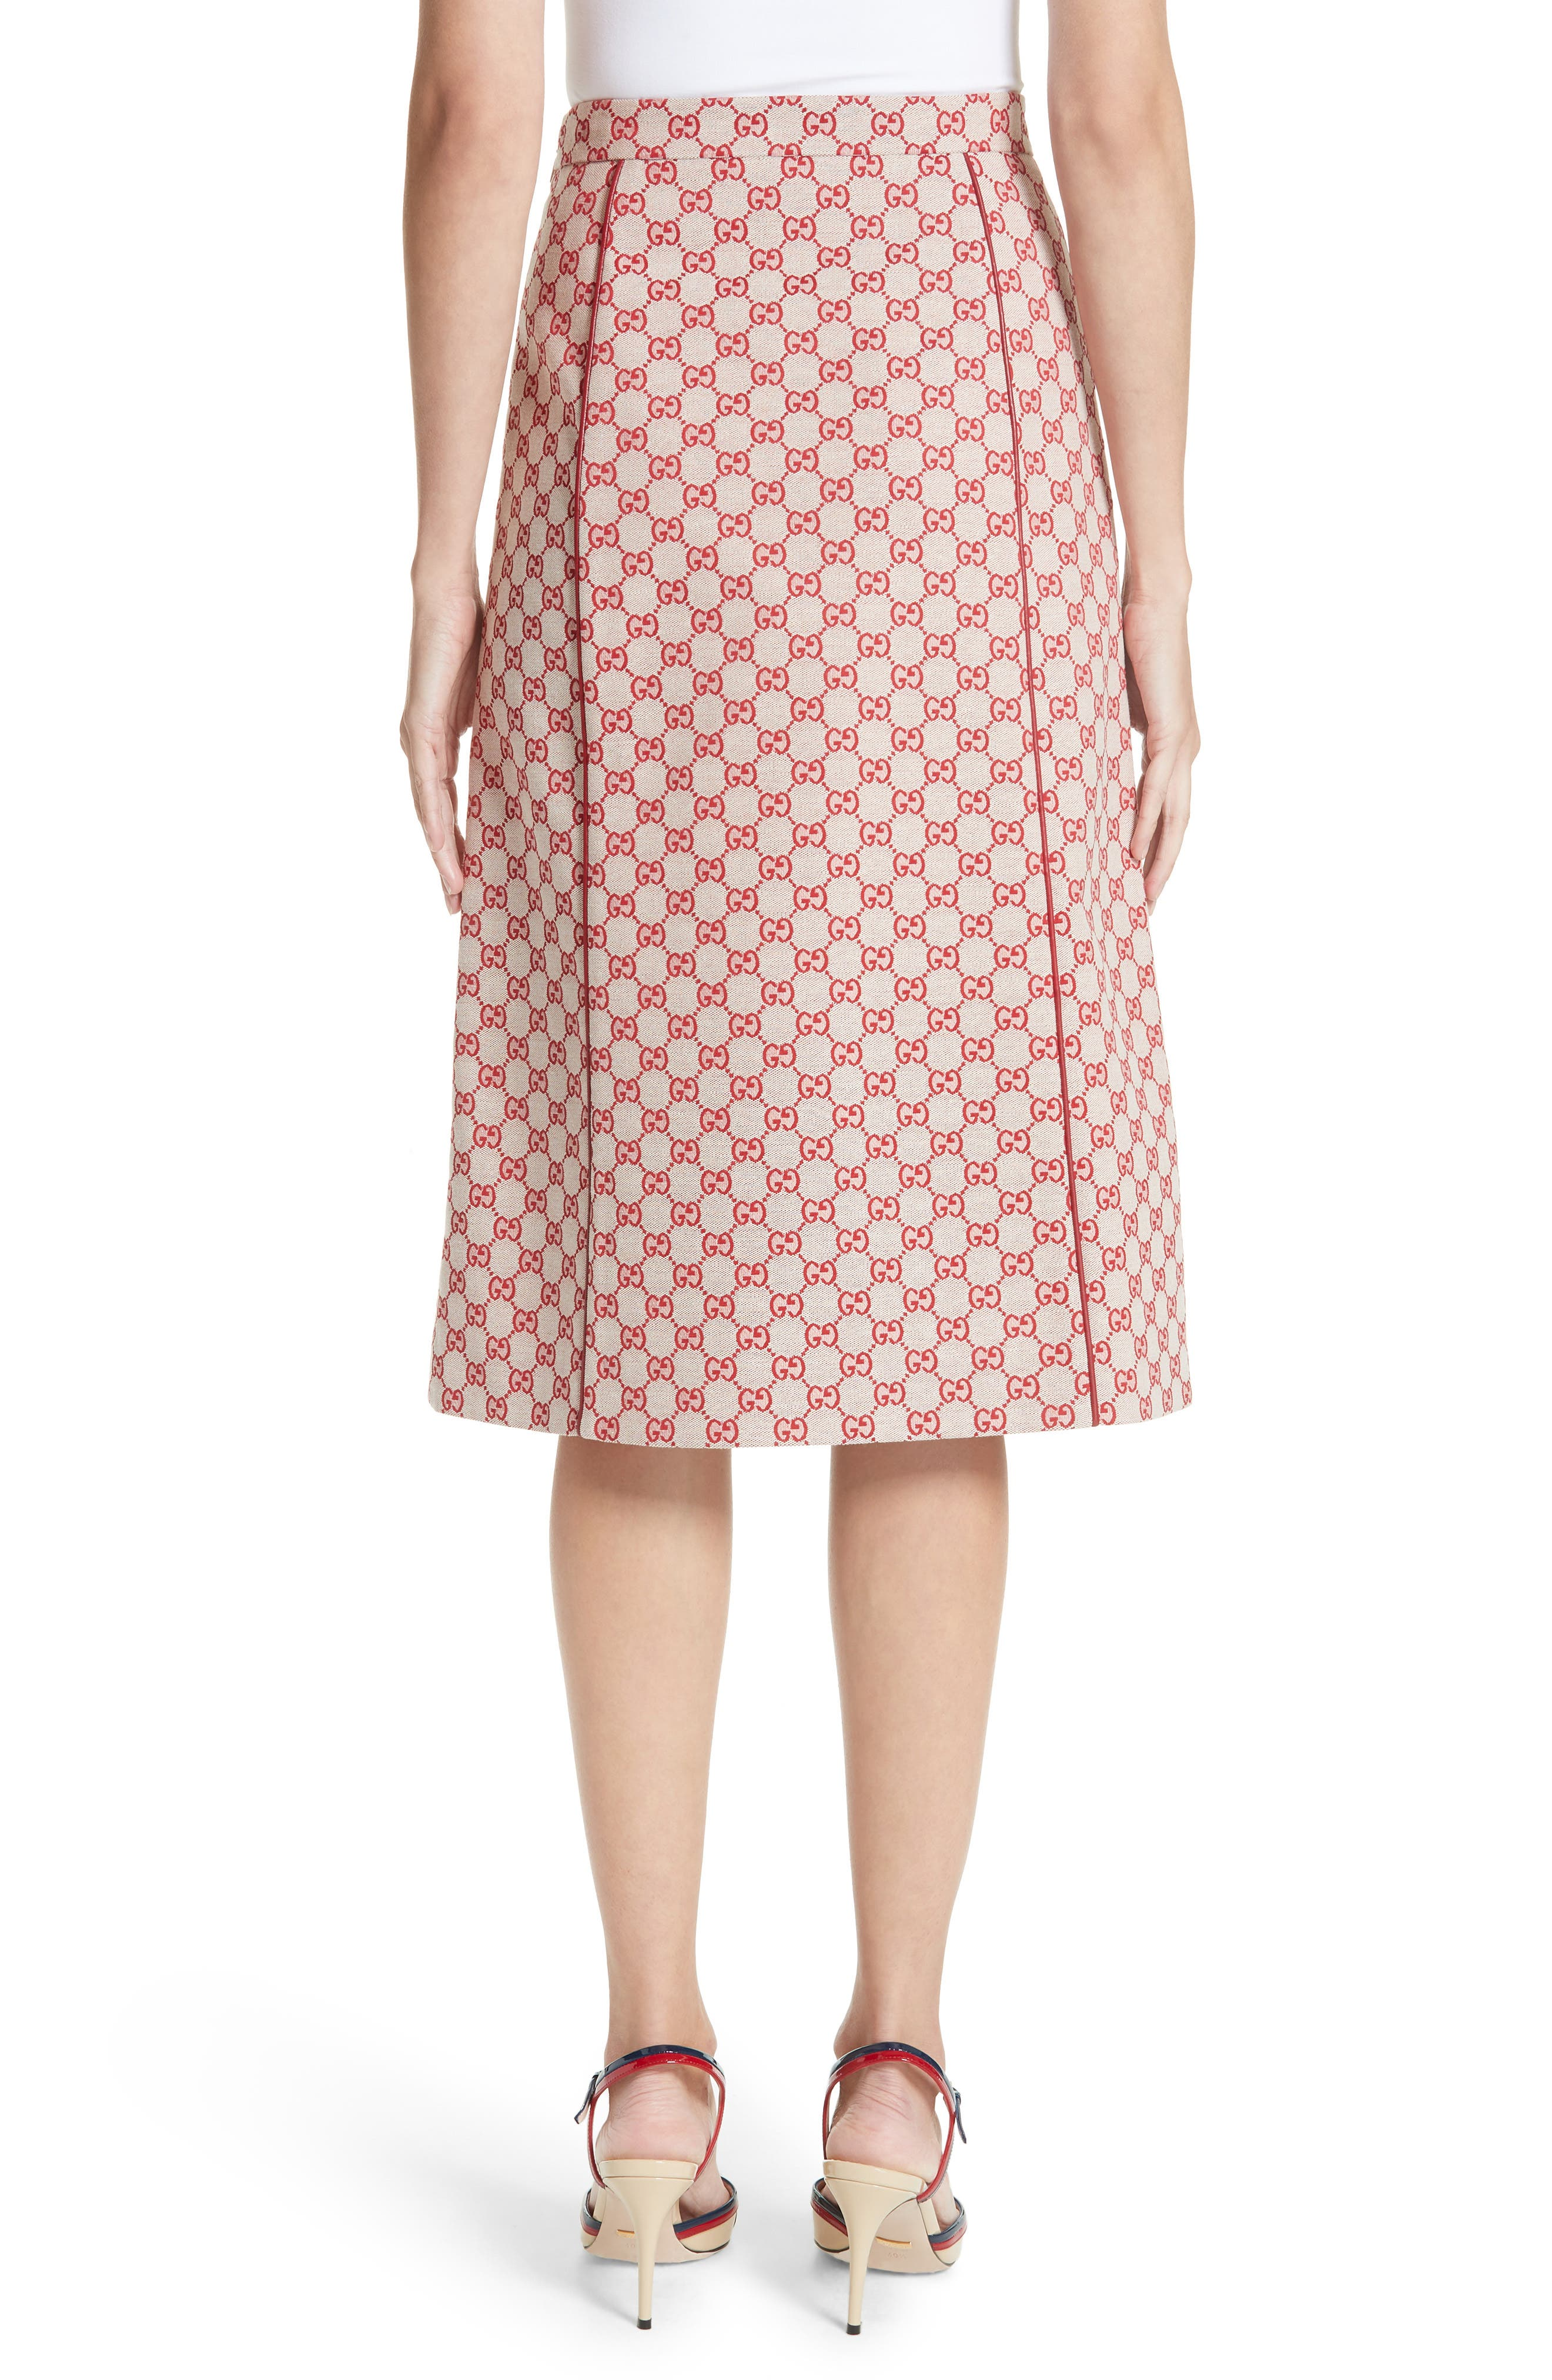 GG Print Canvas A-Line Skirt,                             Alternate thumbnail 2, color,                             GARDENIA/ HIBISCUS RED